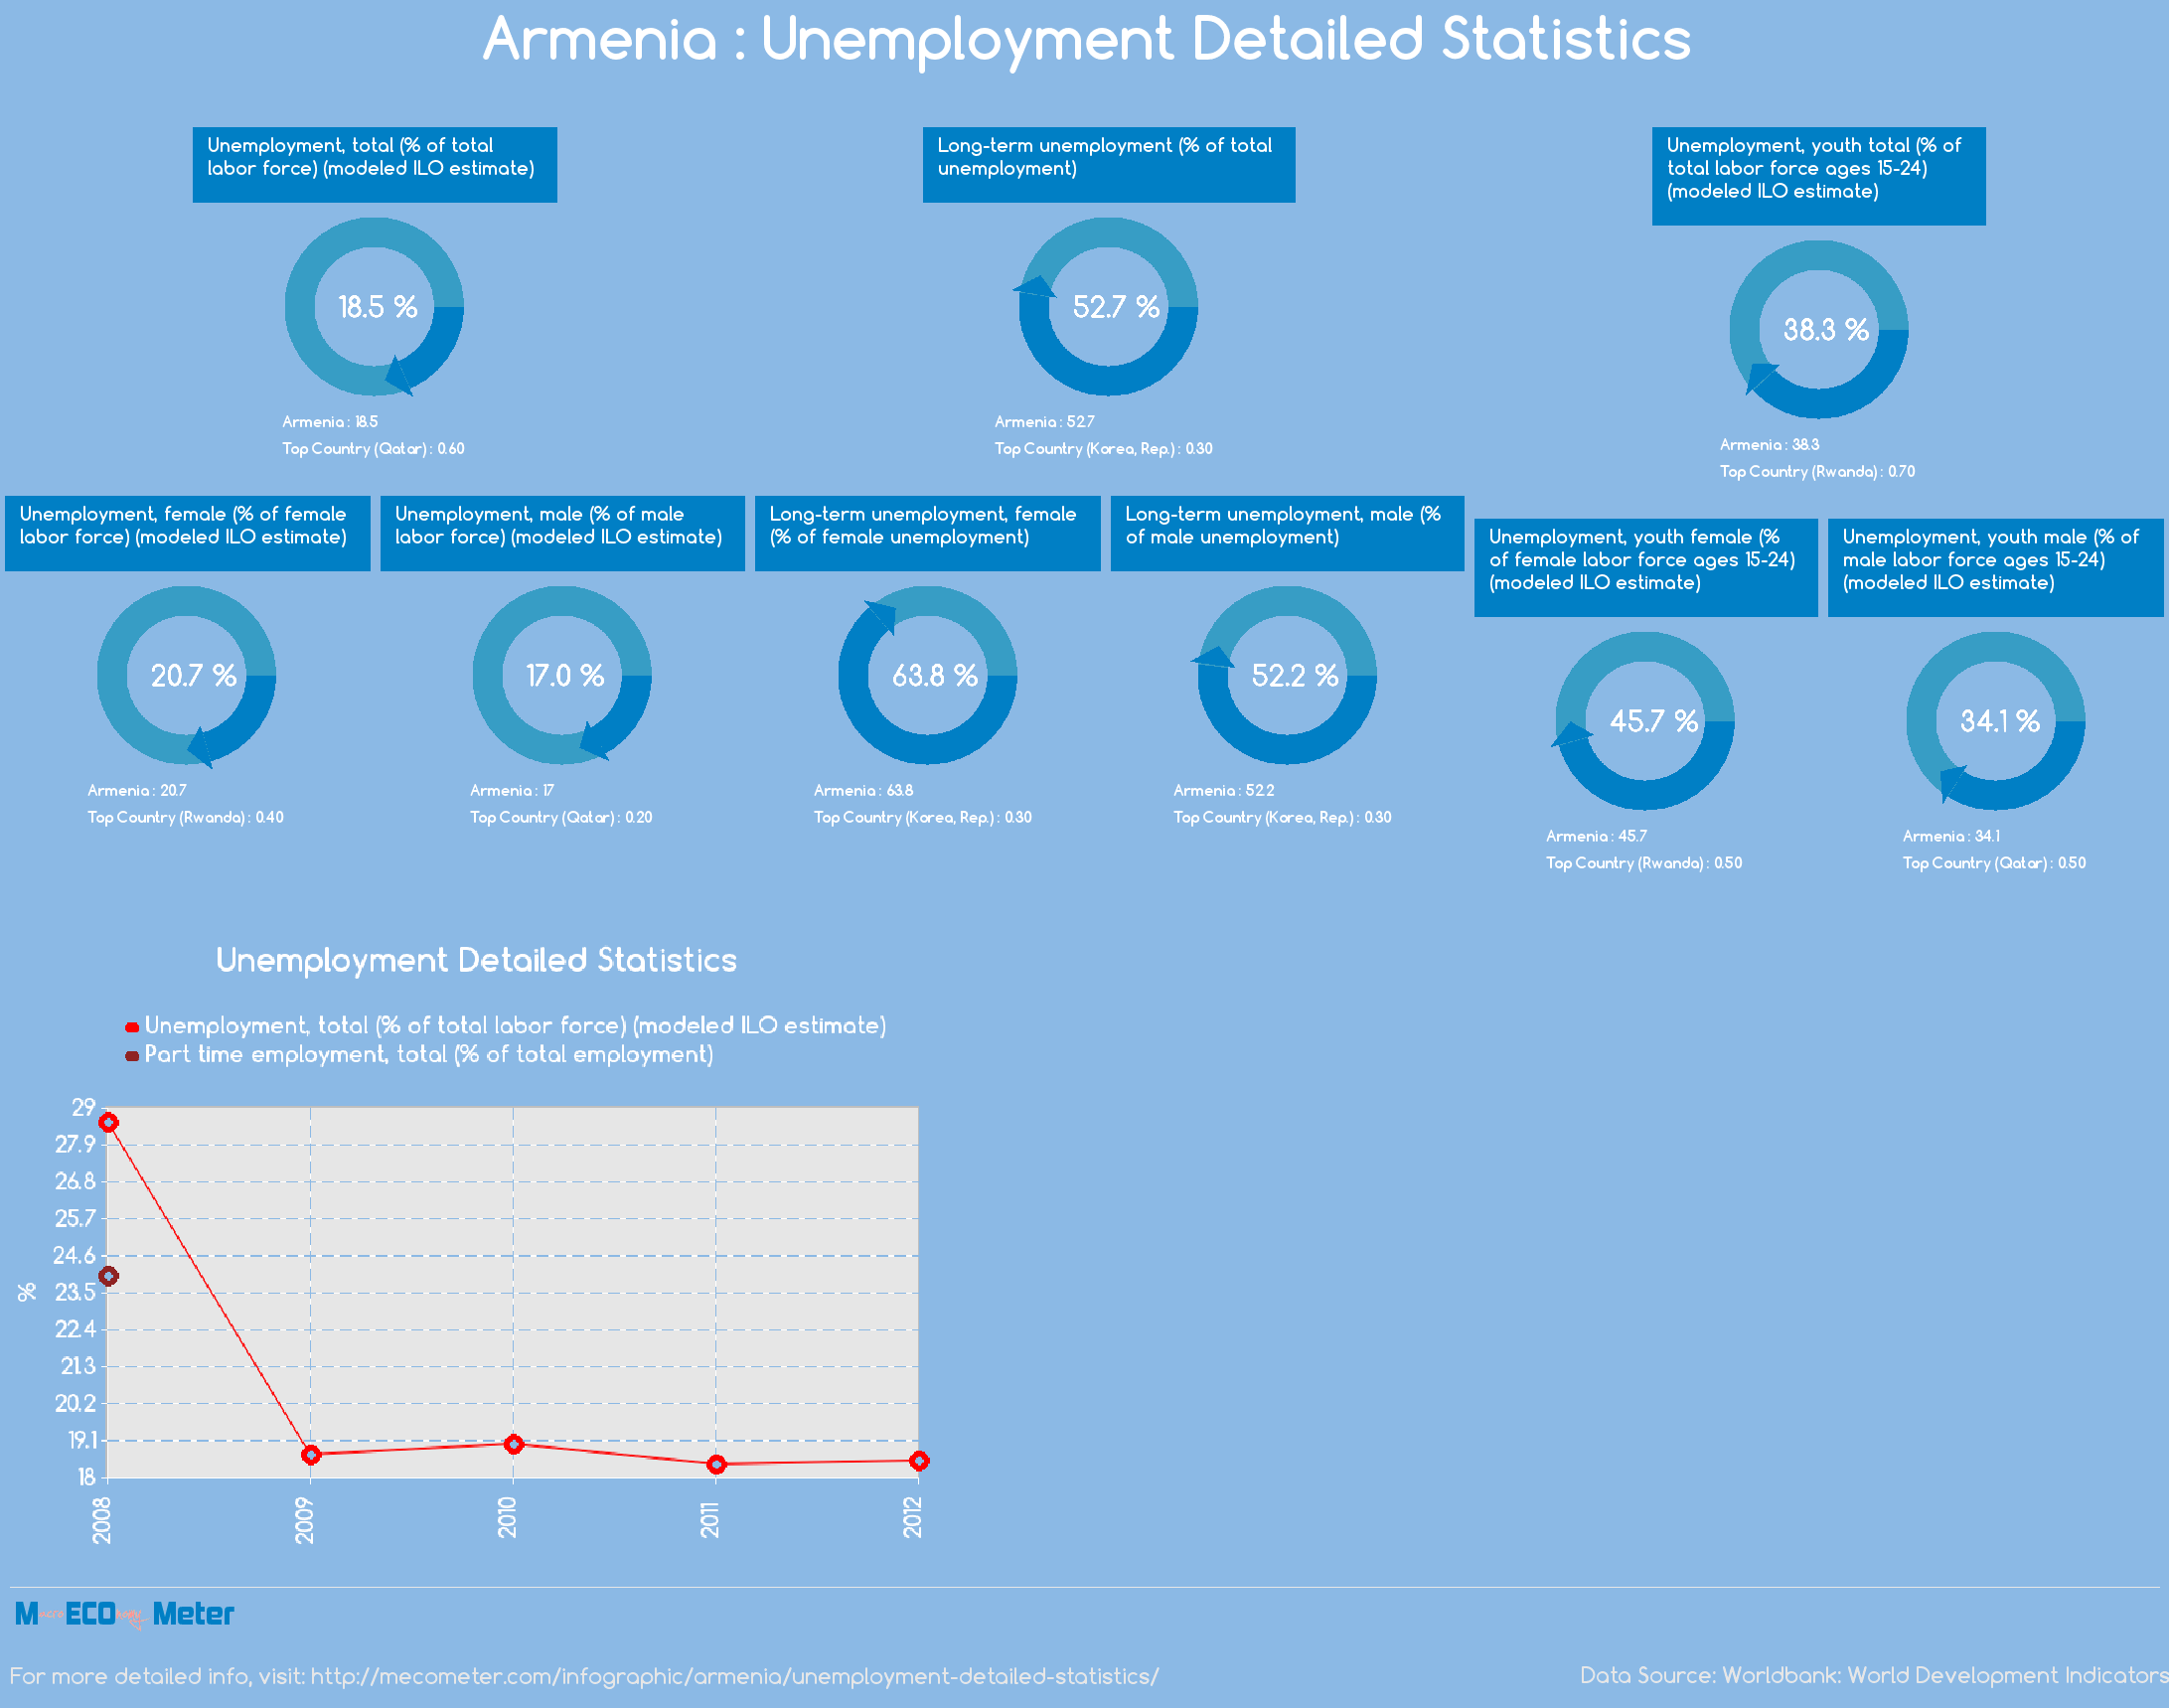 Armenia : Unemployment Detailed Statistics